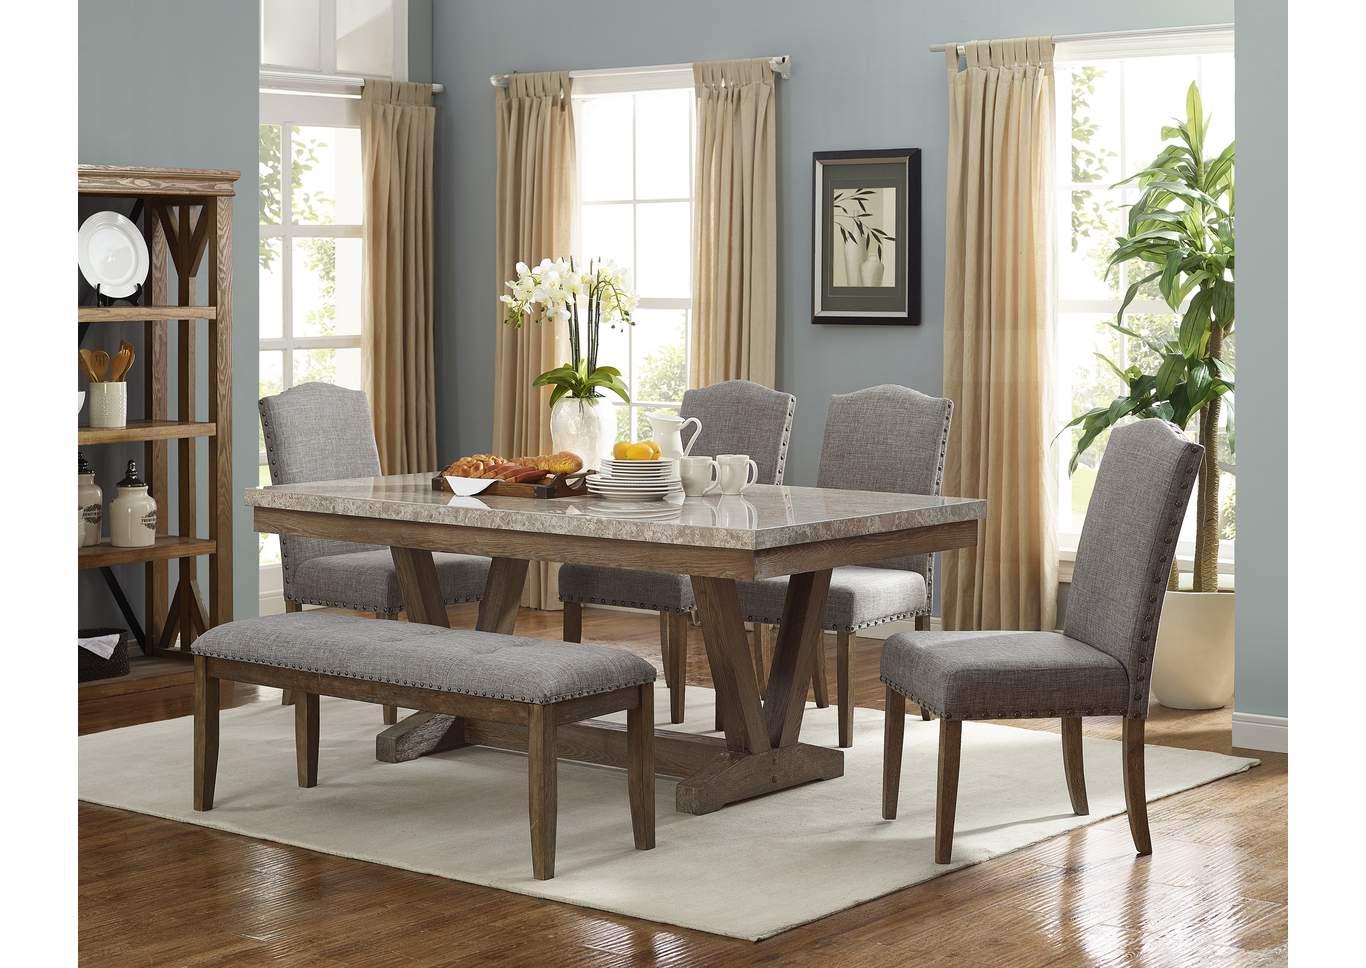 Vesper grey upholstered dining benchcrown mark